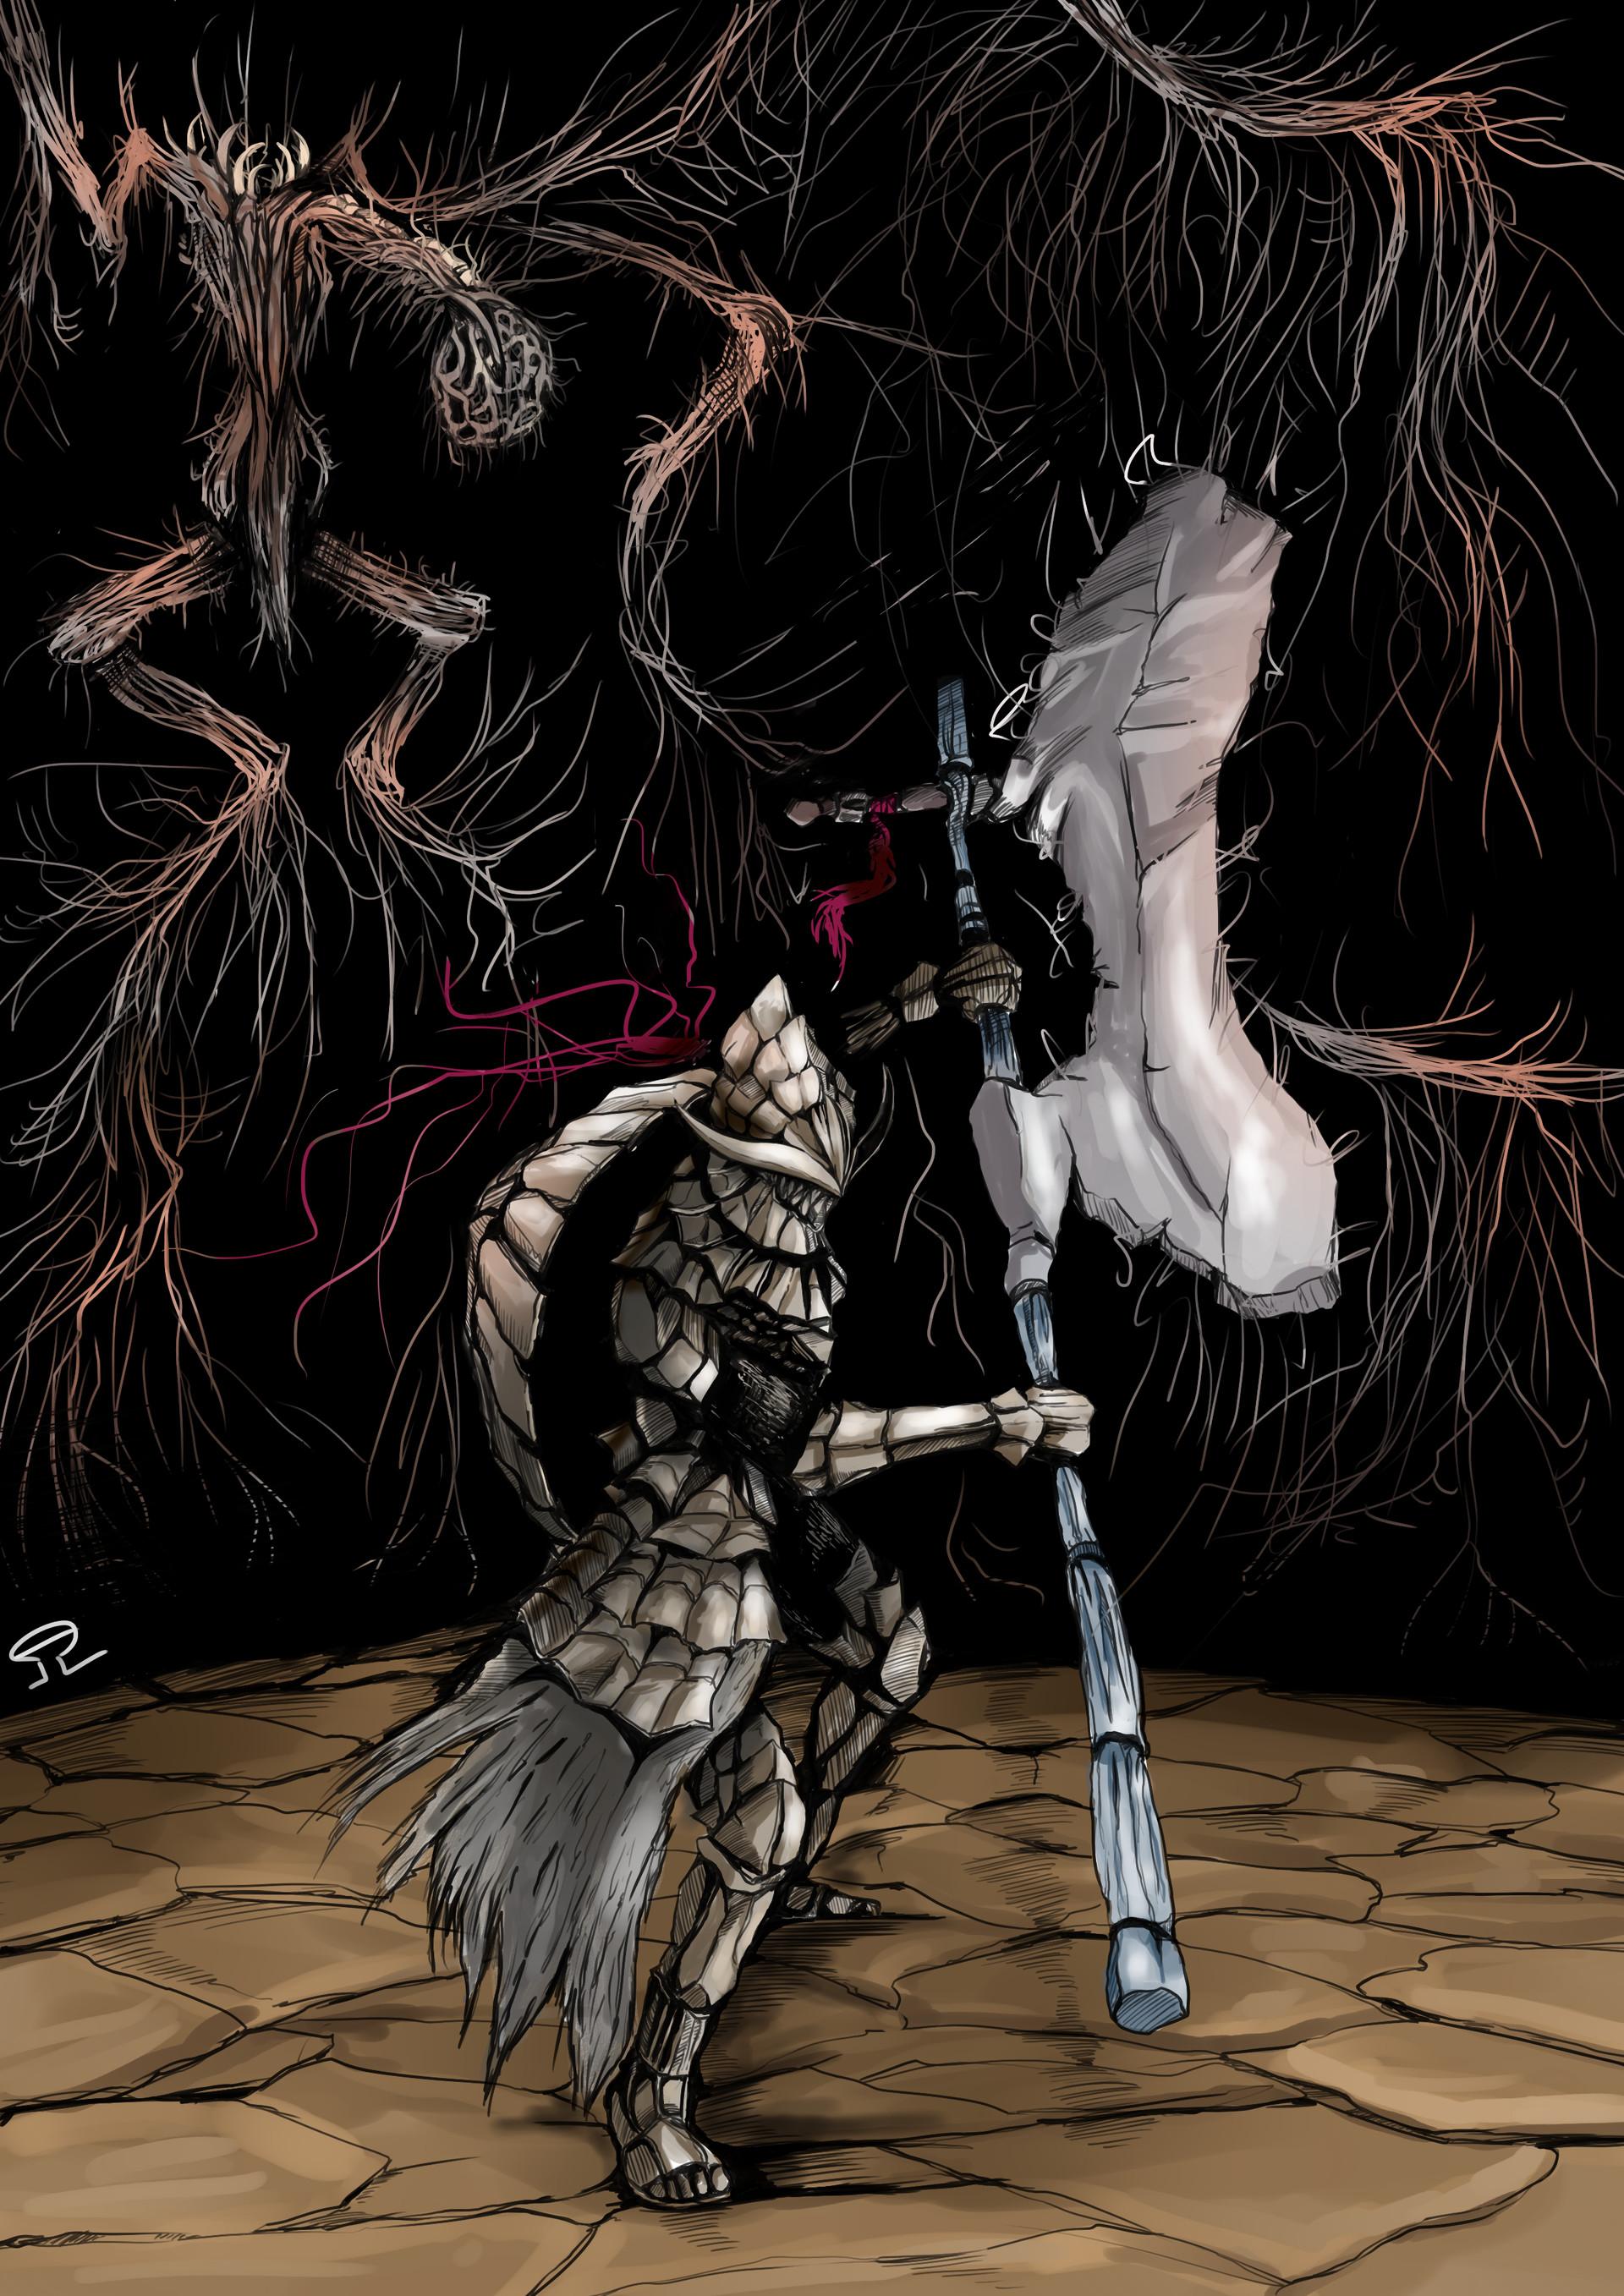 Artstation Dragonslayer Armour Alvh Omega Dragon slayer (paladin) full armor. dragonslayer armour alvh omega